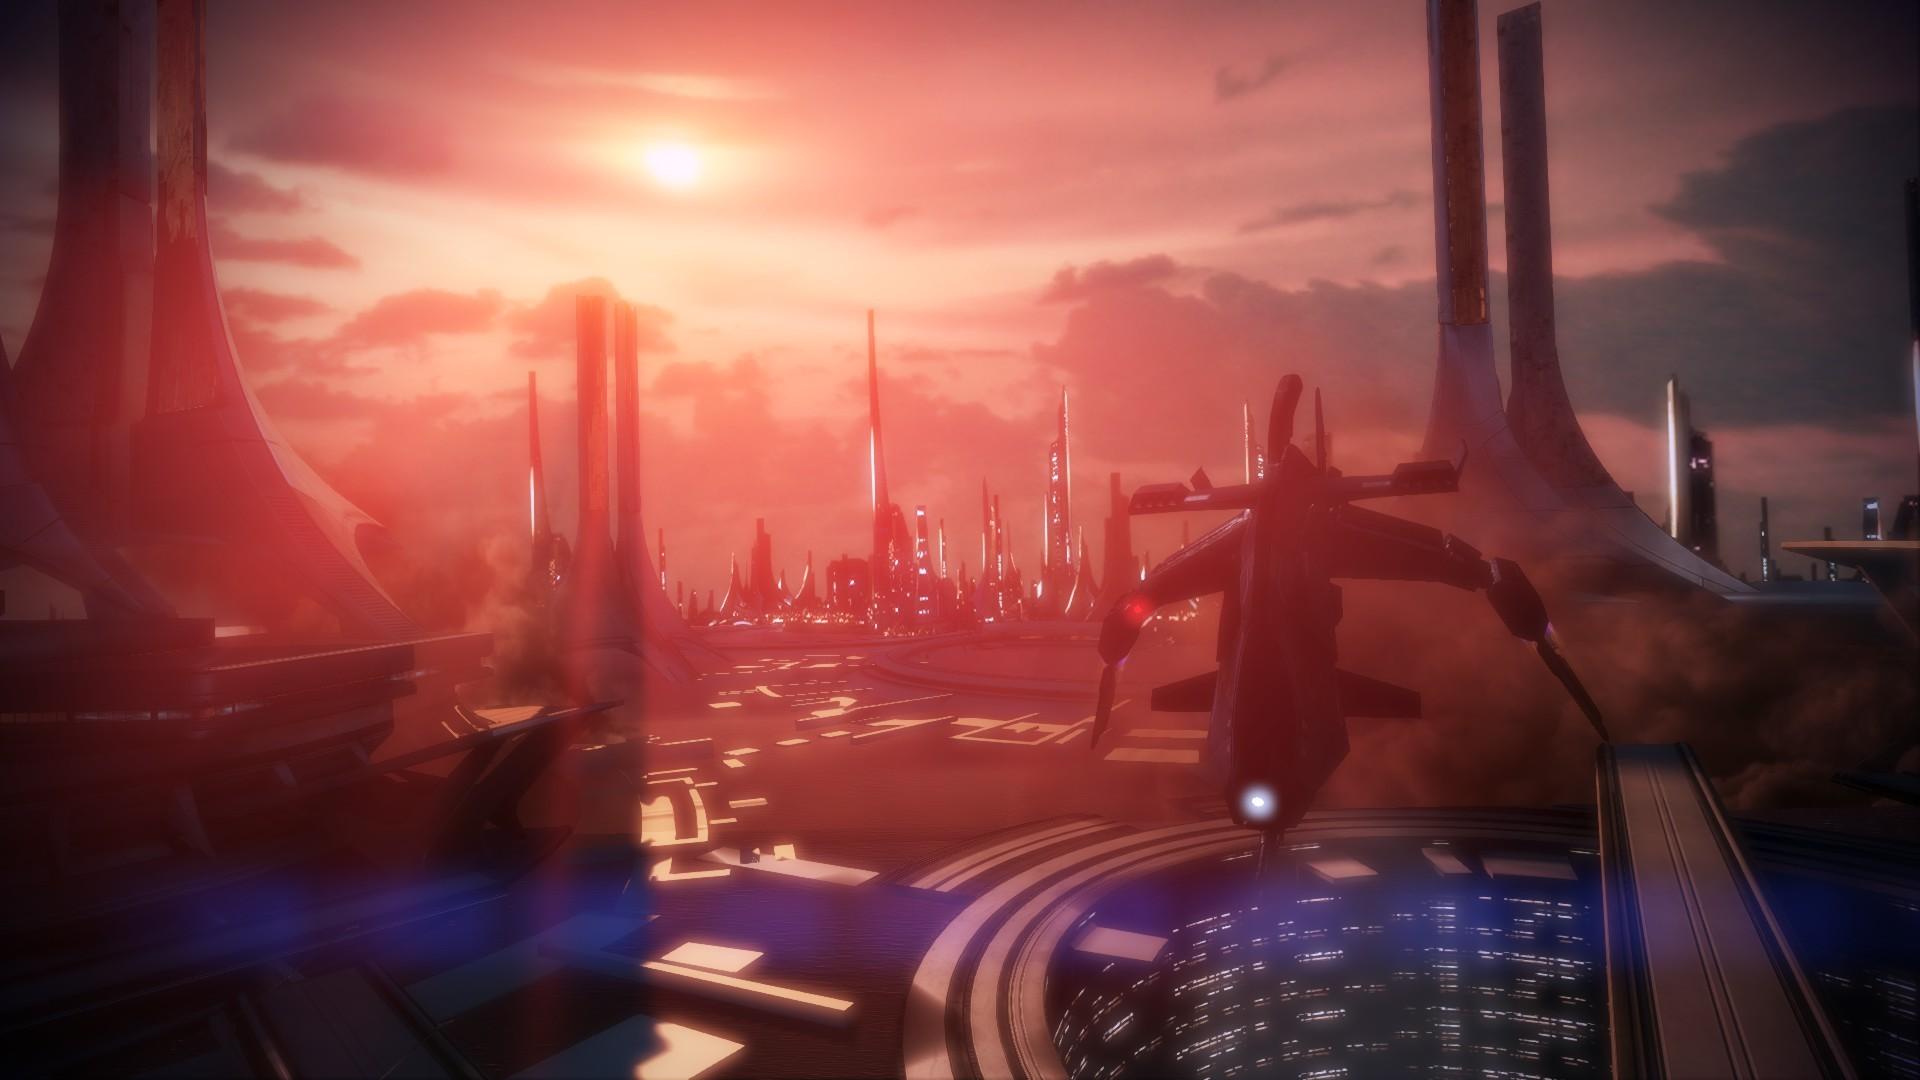 General 1920x1080 building space futuristic Mass Effect 3 video games